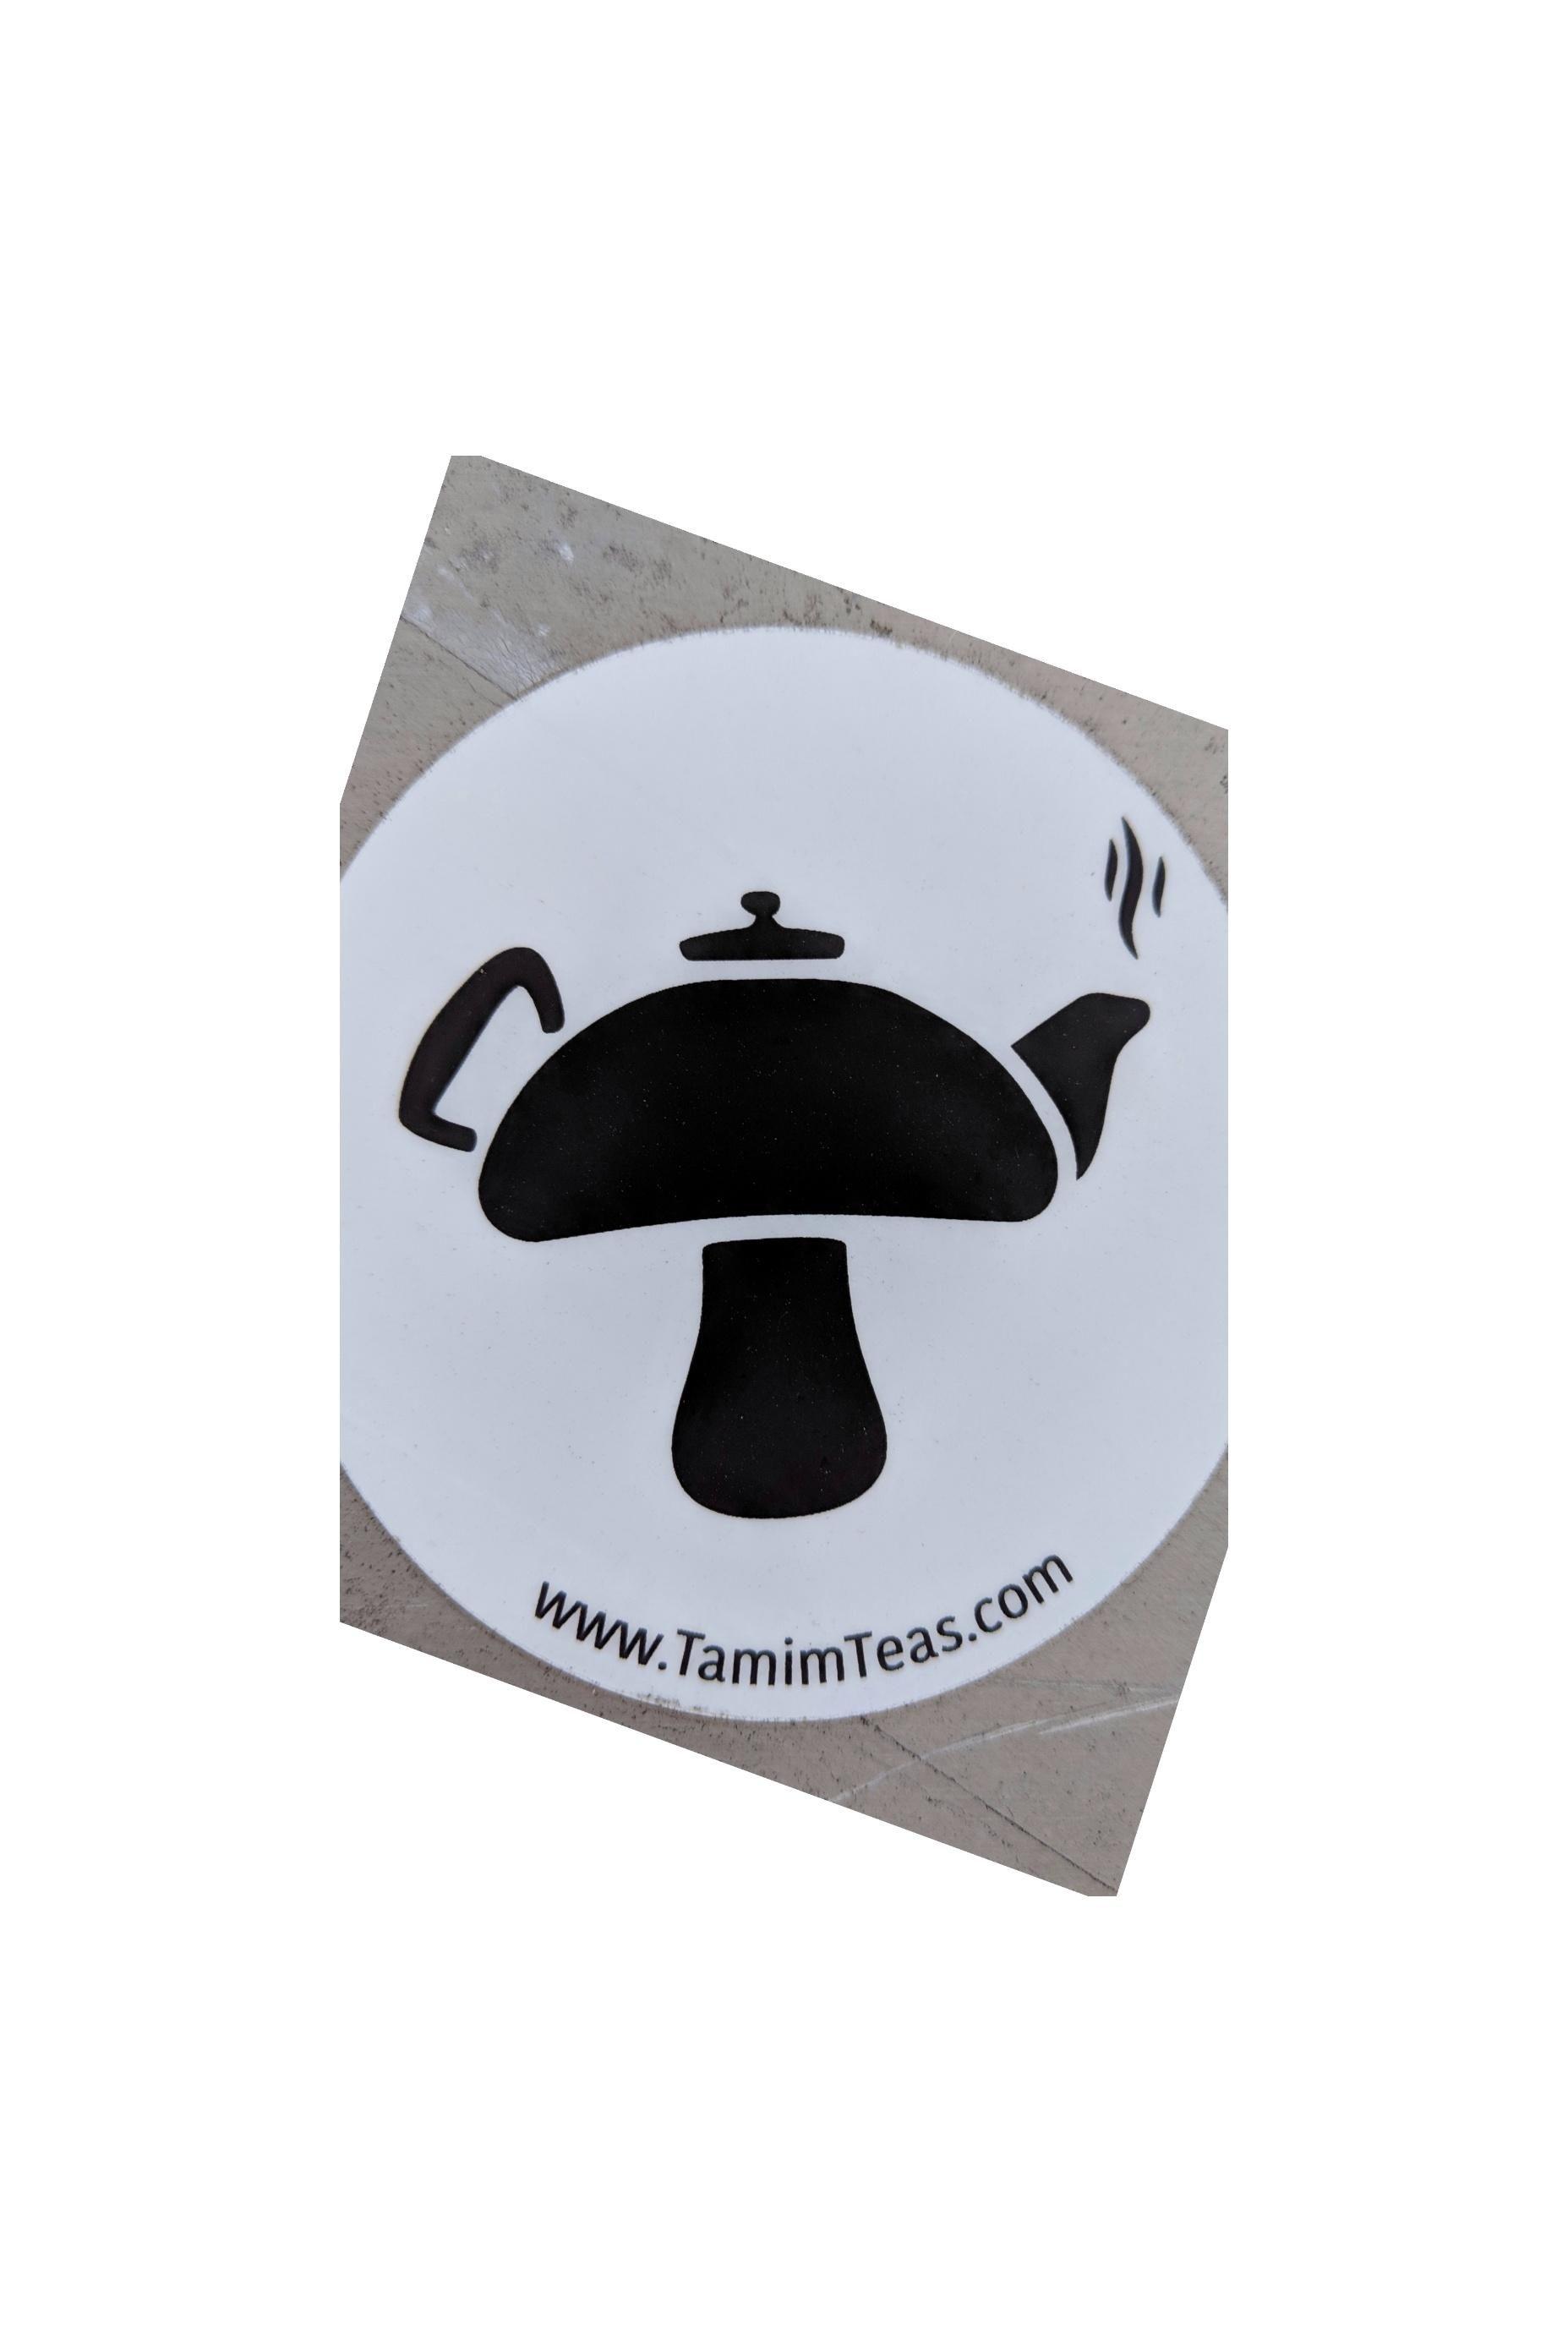 Mushroom tea brand logo (seen as sticker)... Desain